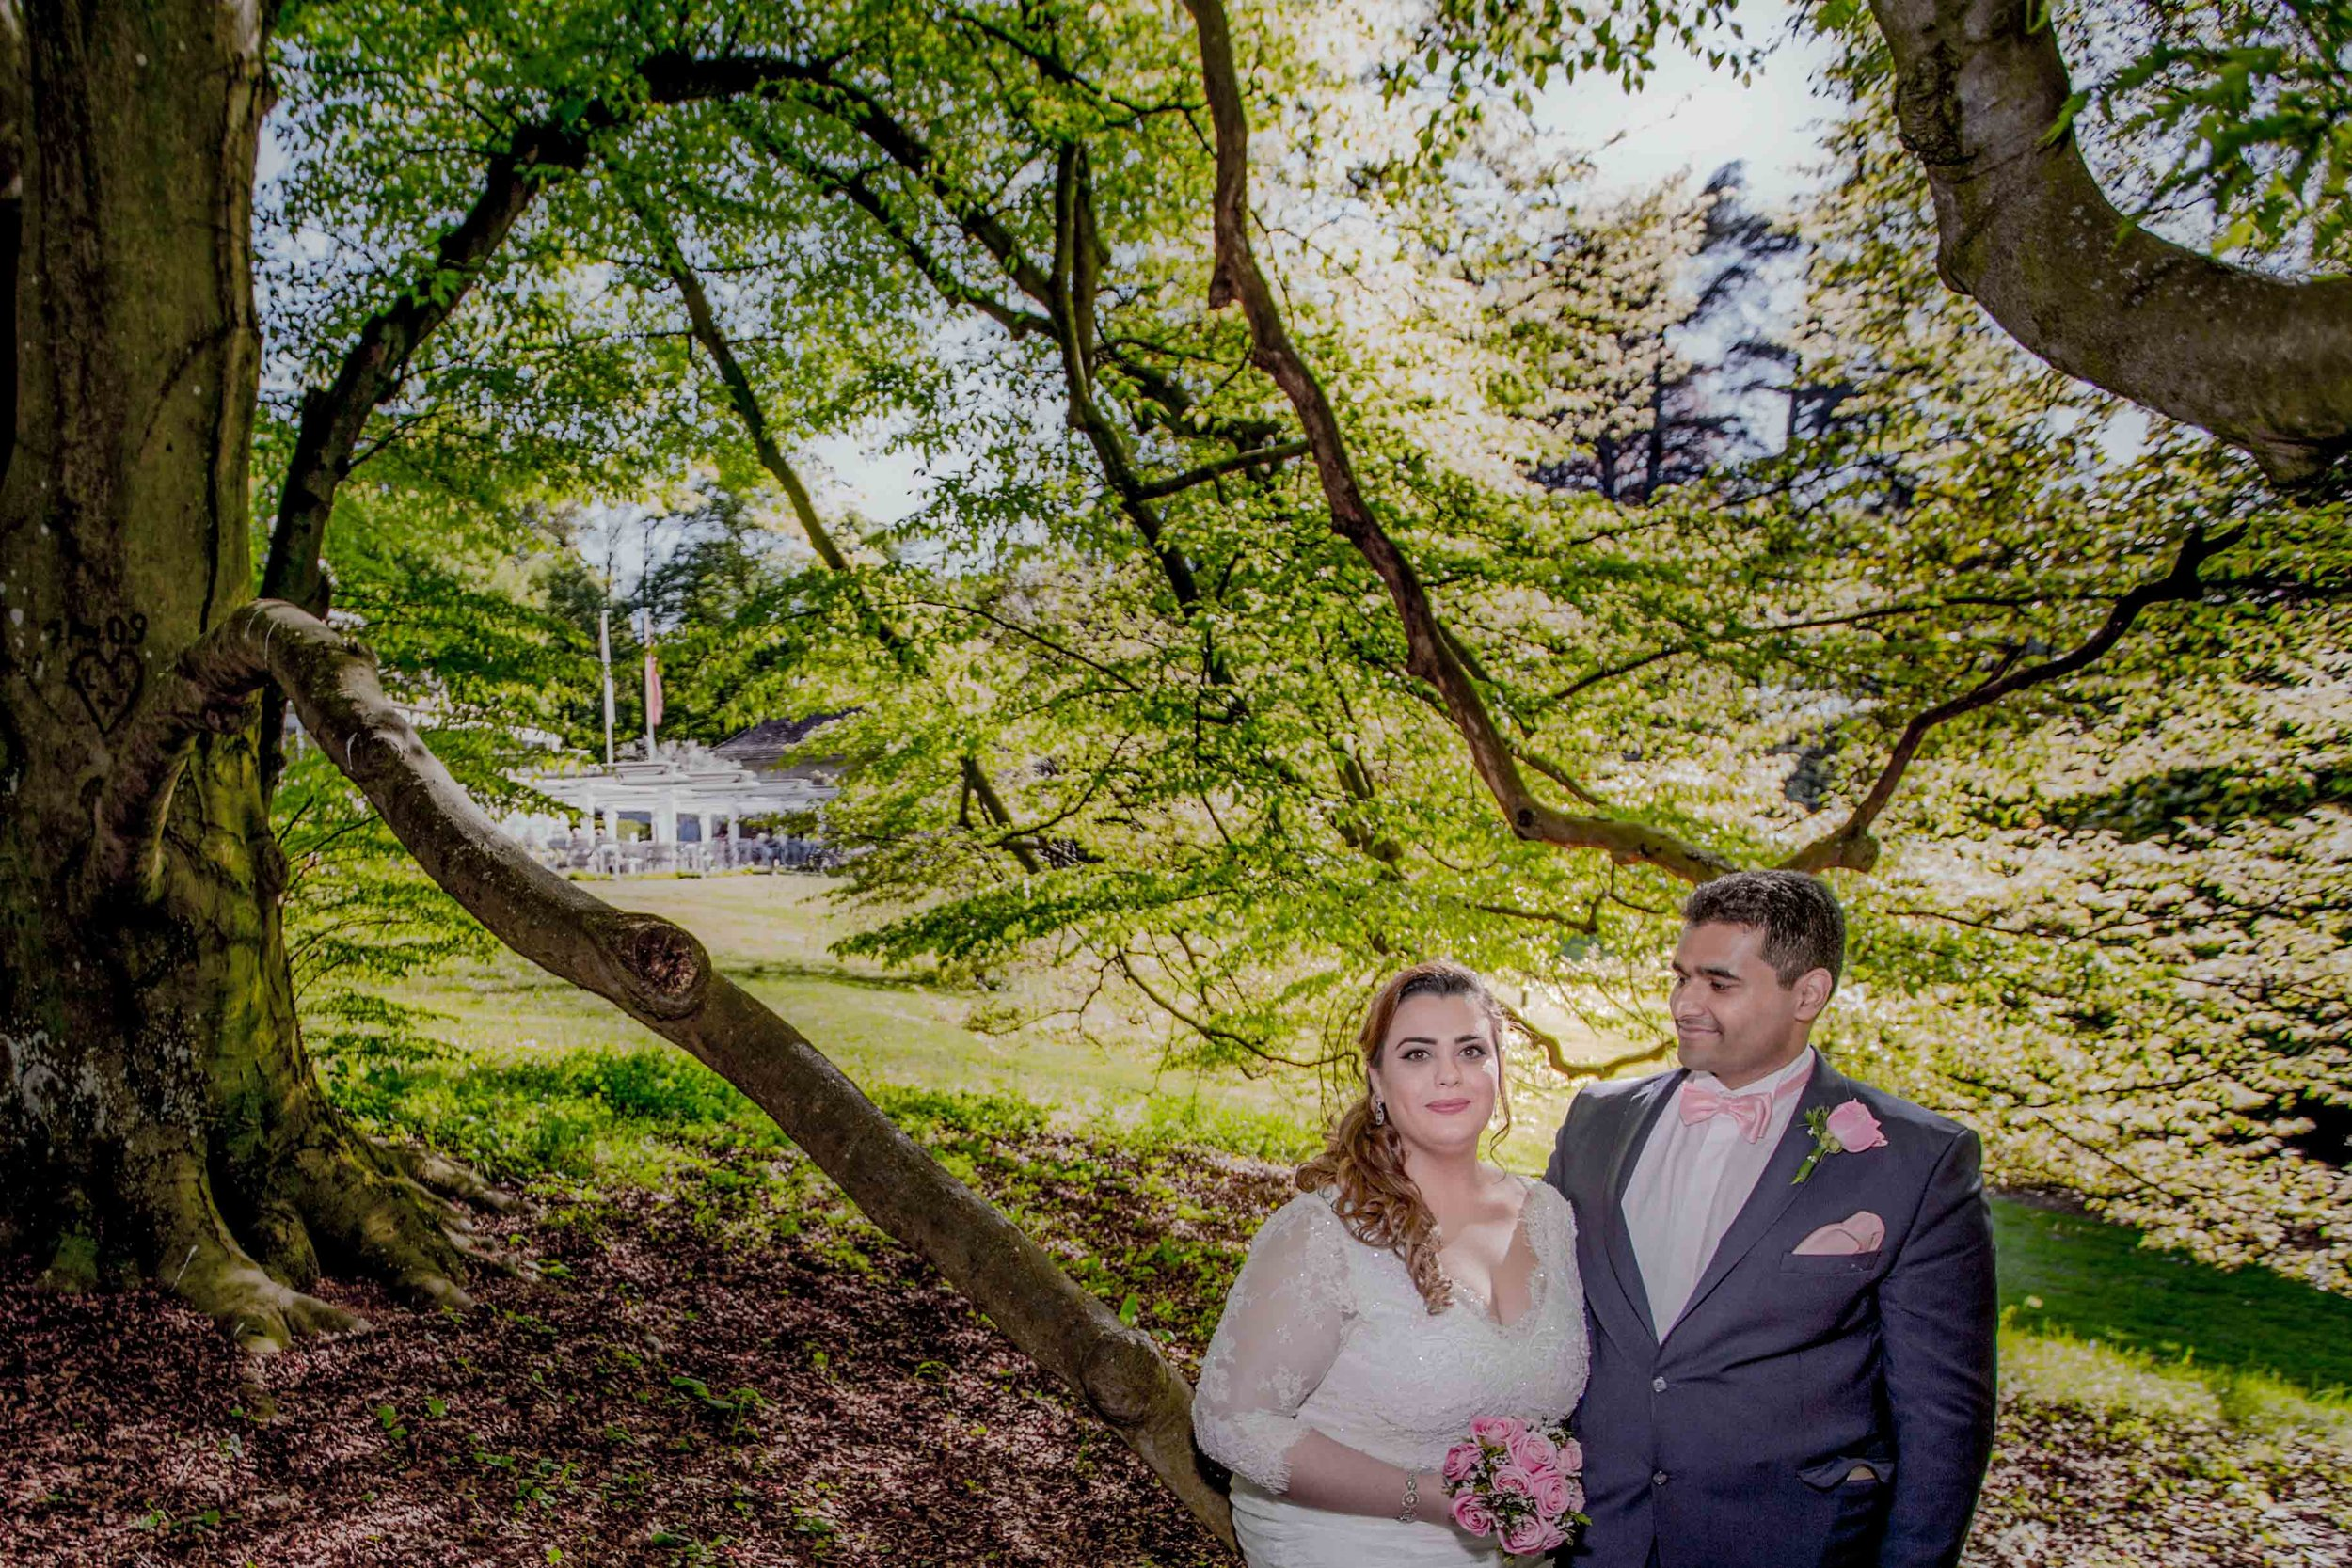 parc-des-eaux-vives-destination-wedding-photographer-geneva-switzerland-natalia-smith-photography-35.jpg